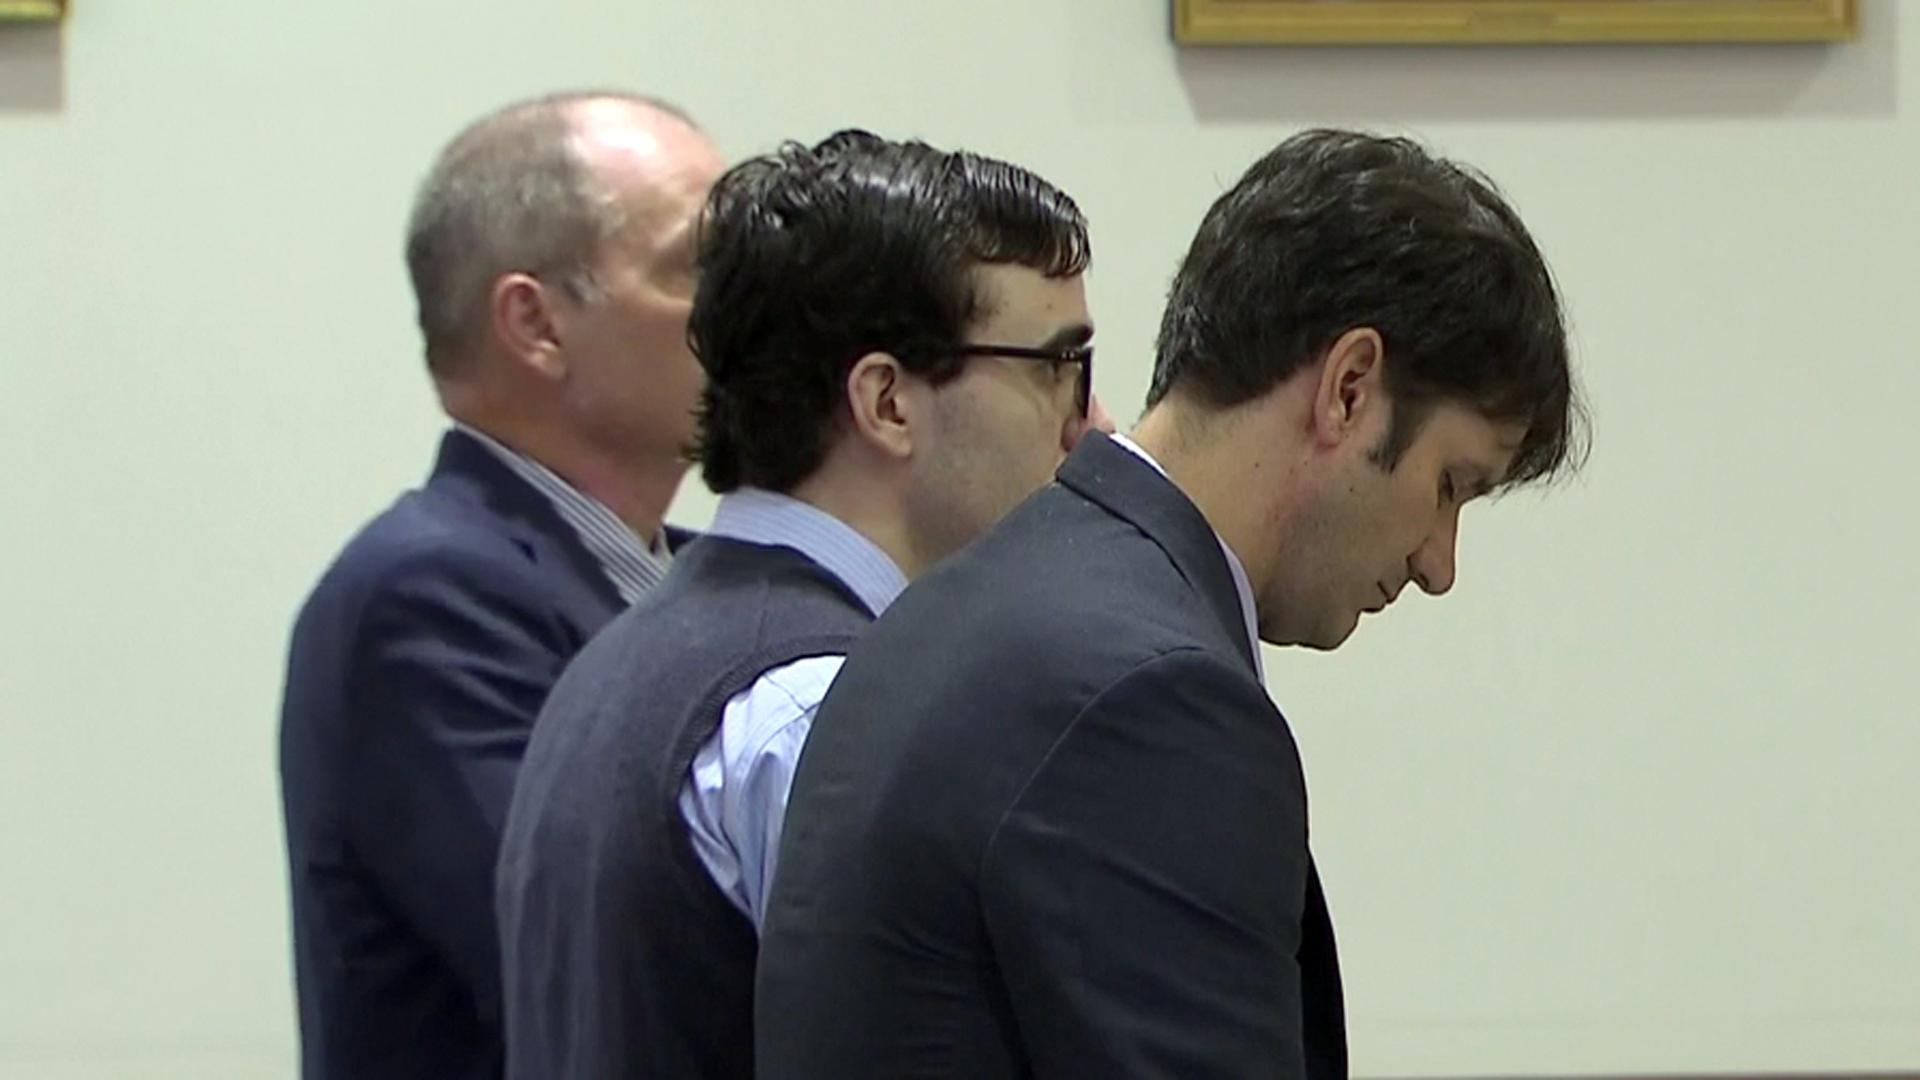 Texas man gets life sentence for robbing, killing Granville